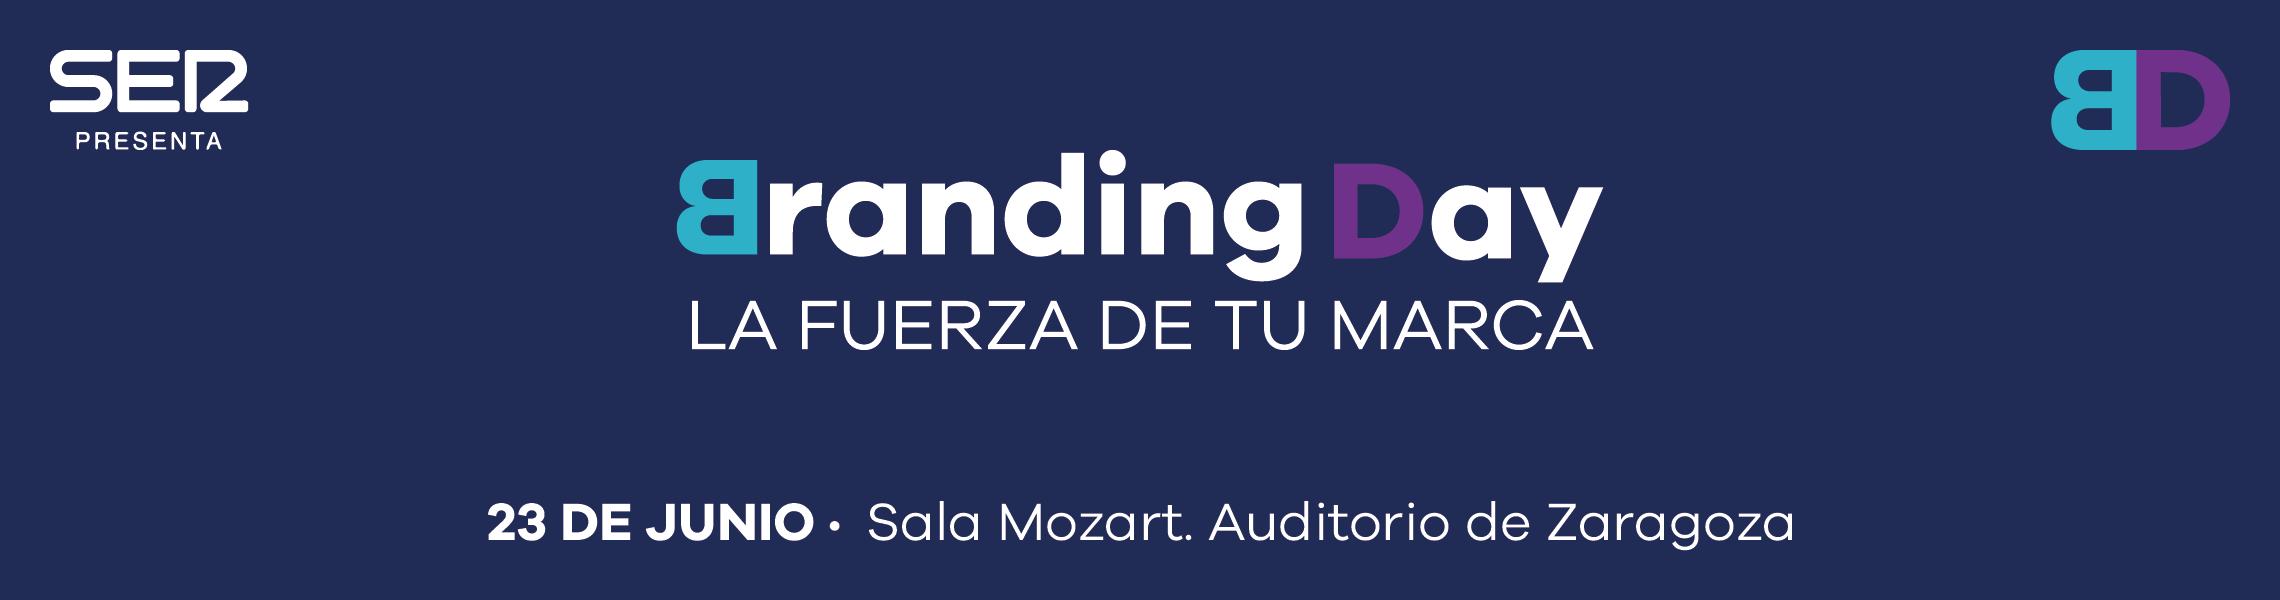 Branding Day Zaragoza